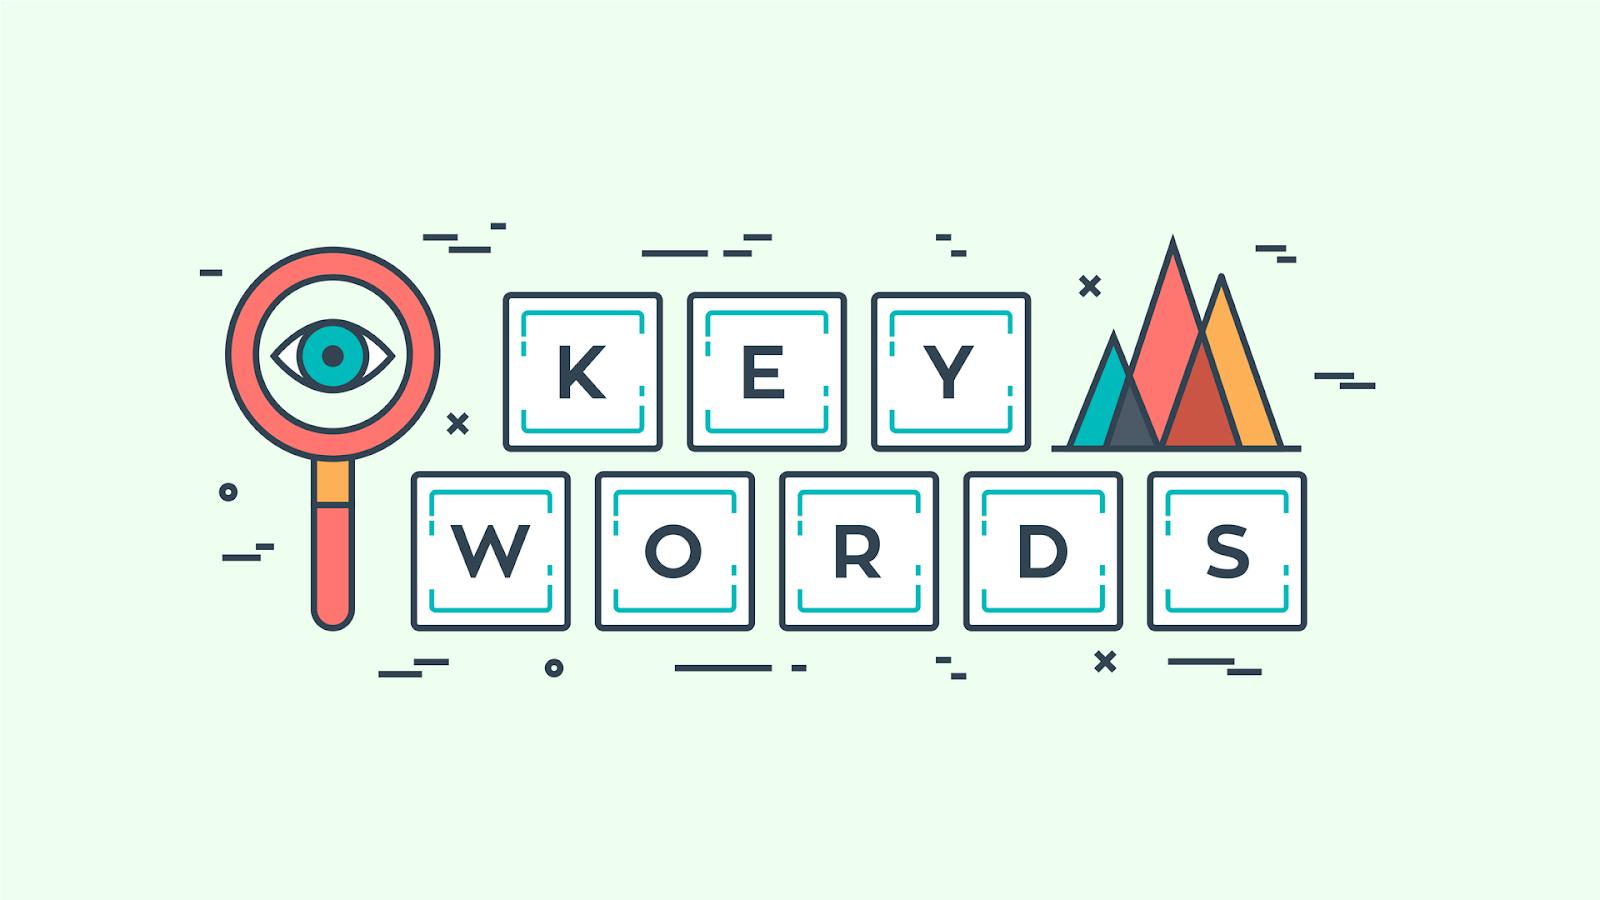 keyword analysis - keywords